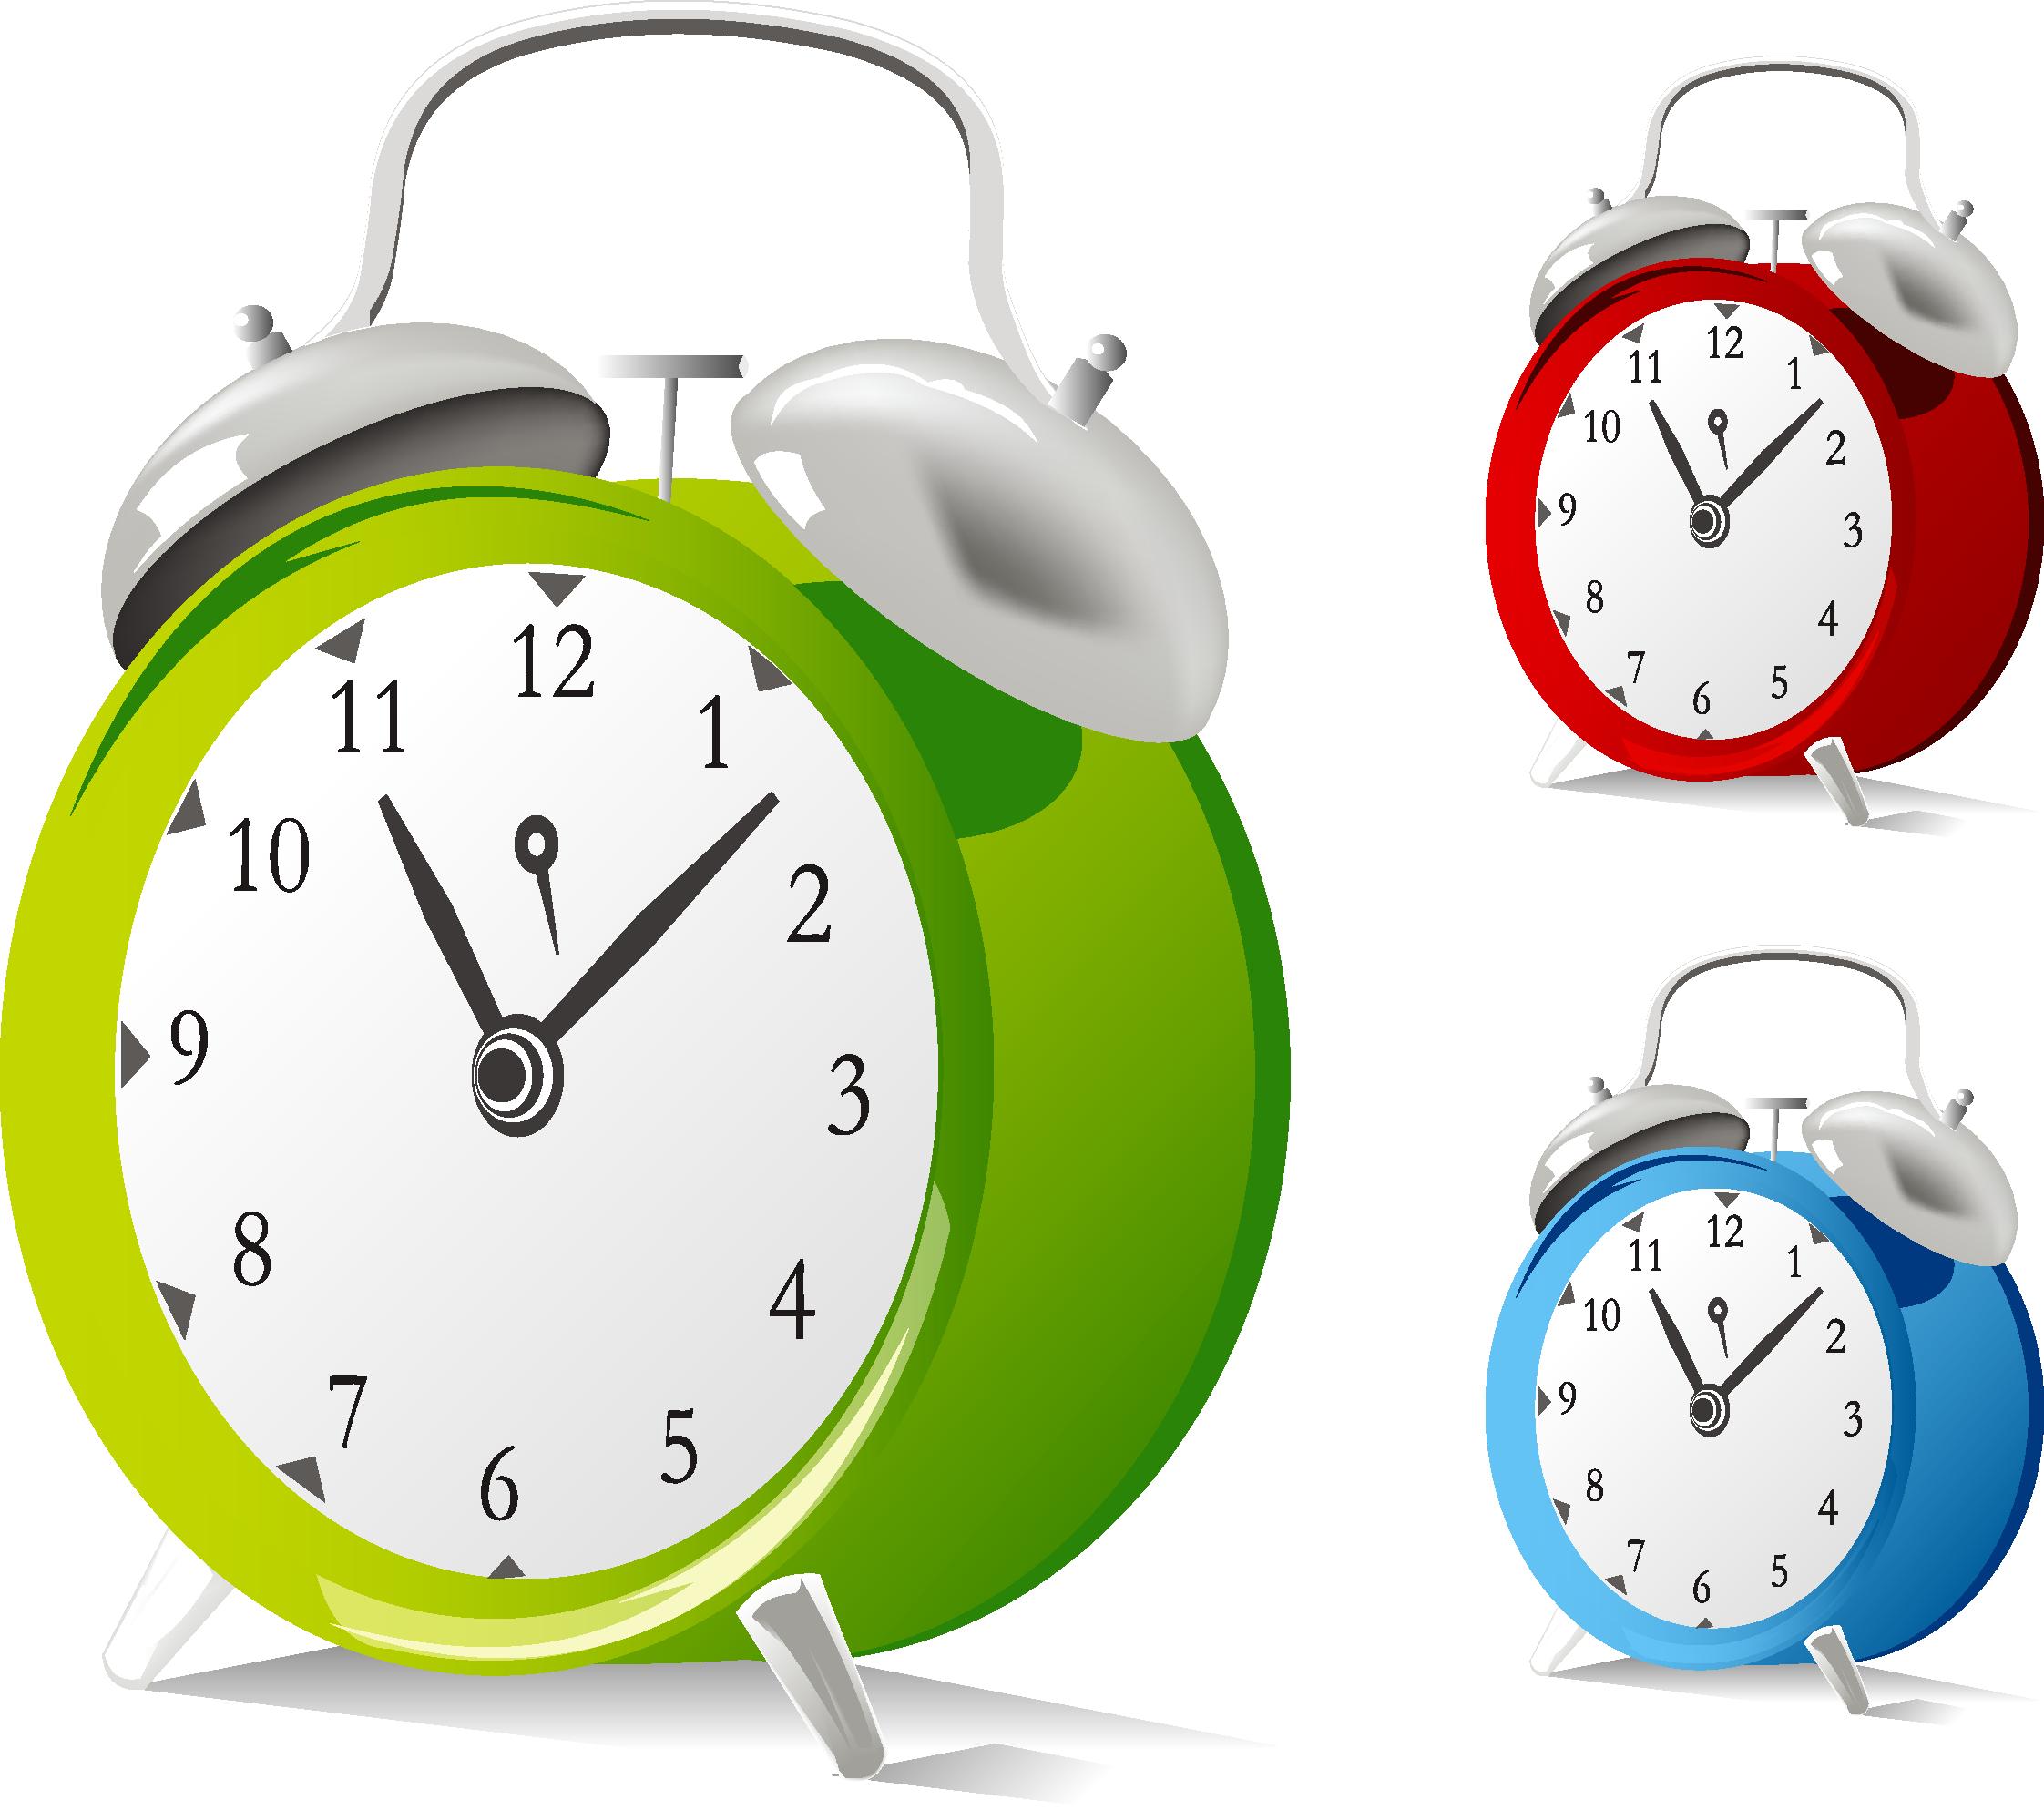 2244x1987 Table Alarm Clock Clip Art